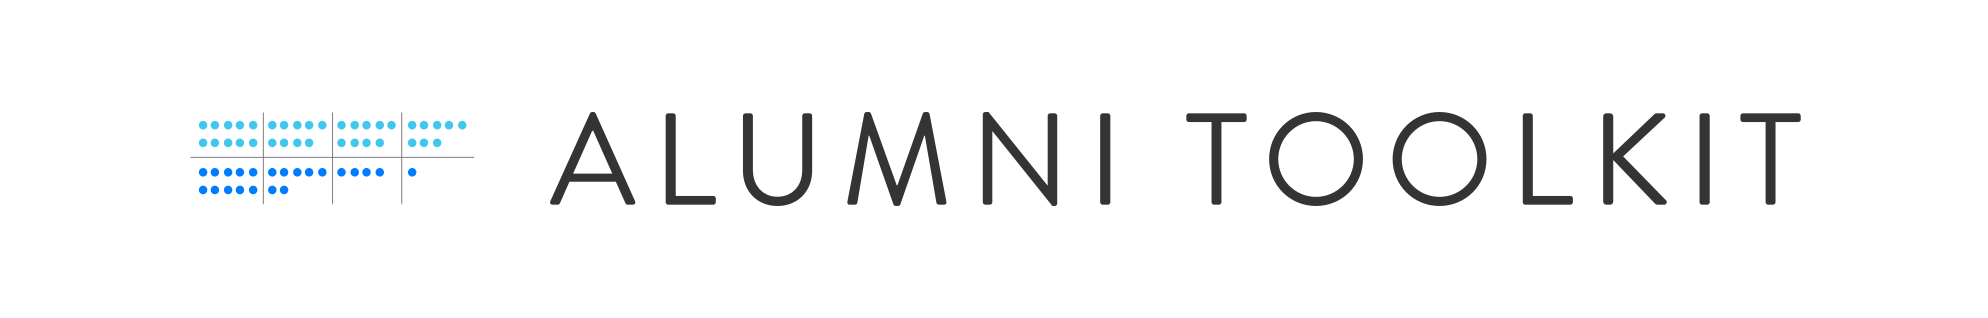 Alumni Toolkit final logo wide.png